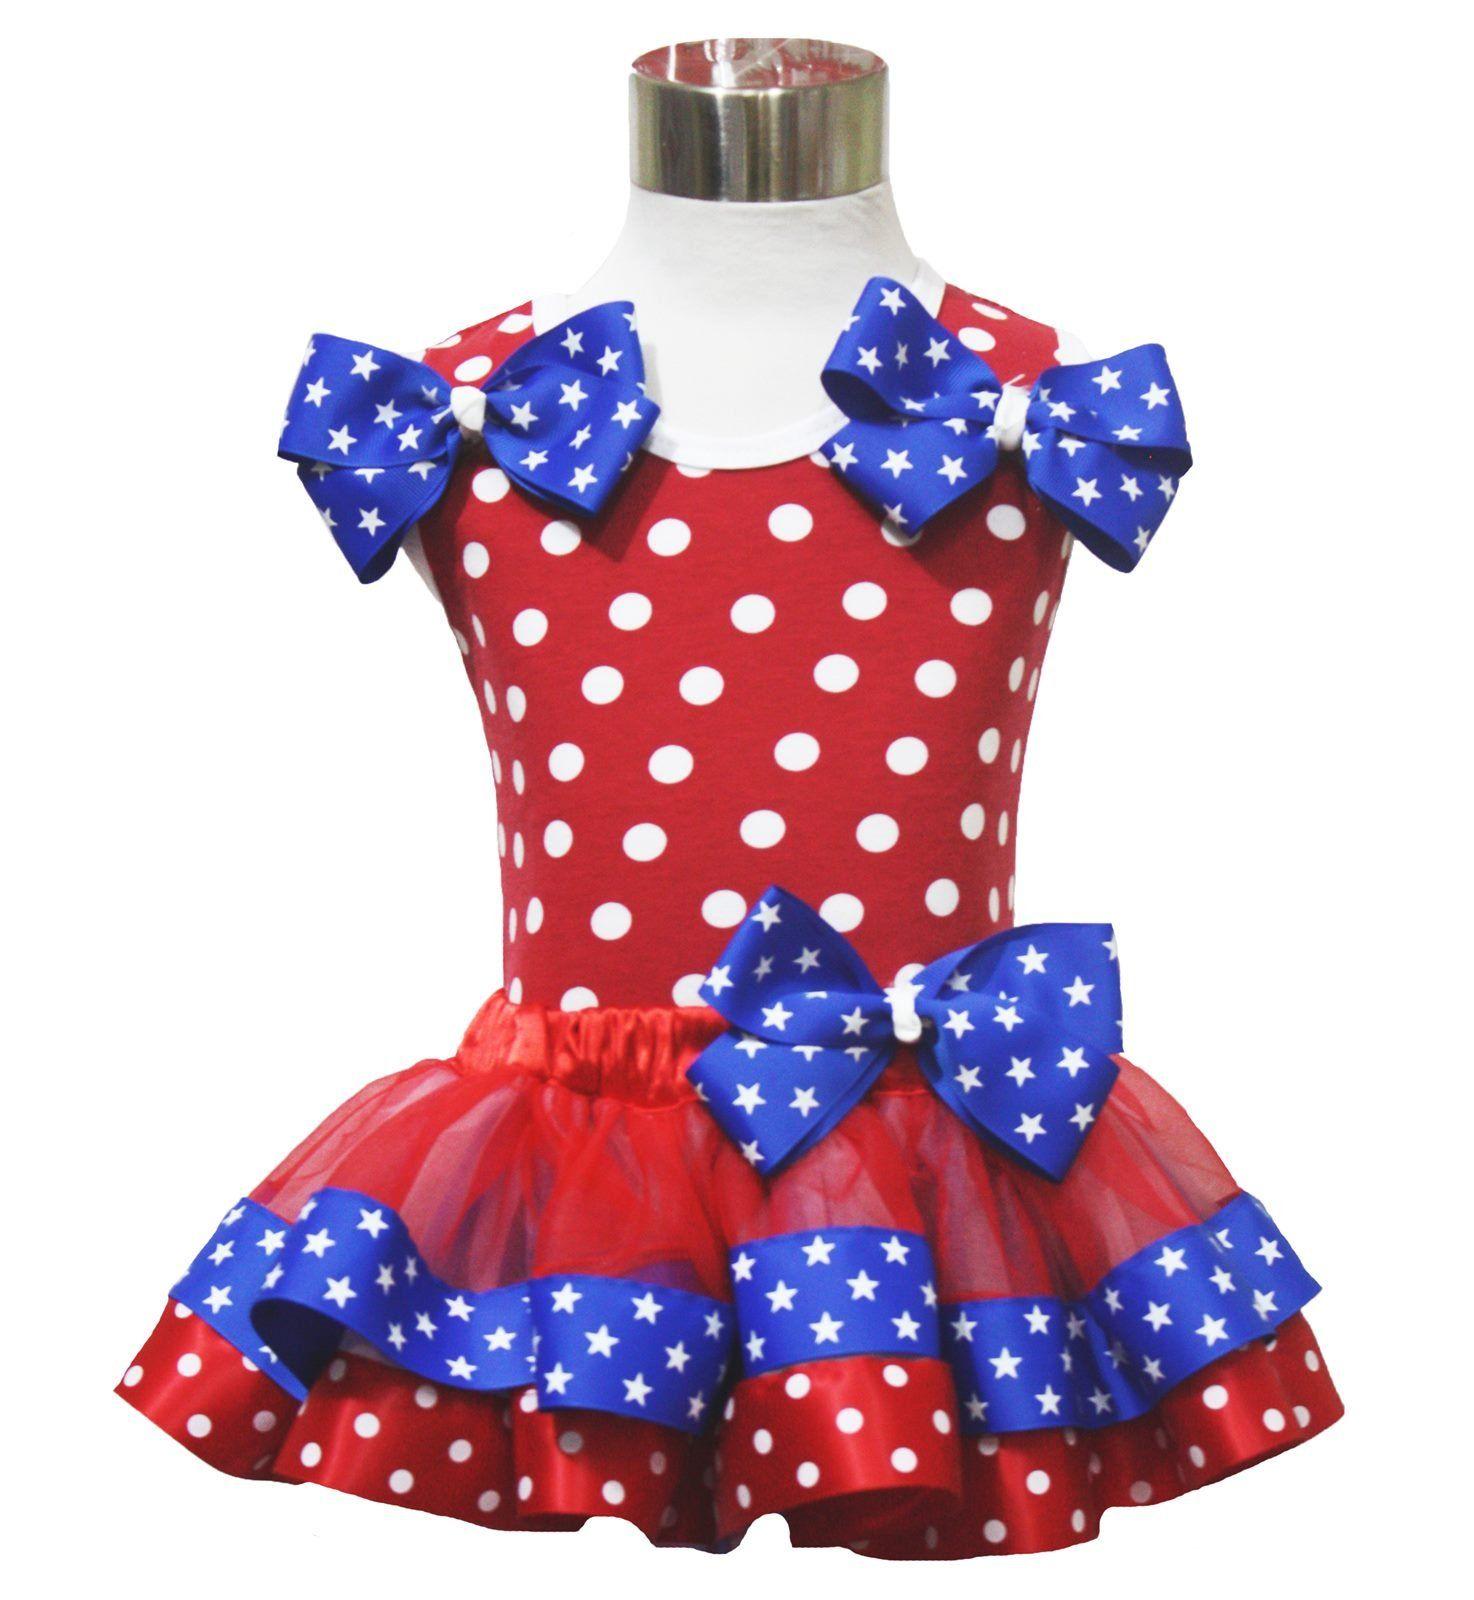 Petitebella USA Sequin LOVE Patriotic Stars Red Cotton Shirt Blue Skirt Set 1-8y